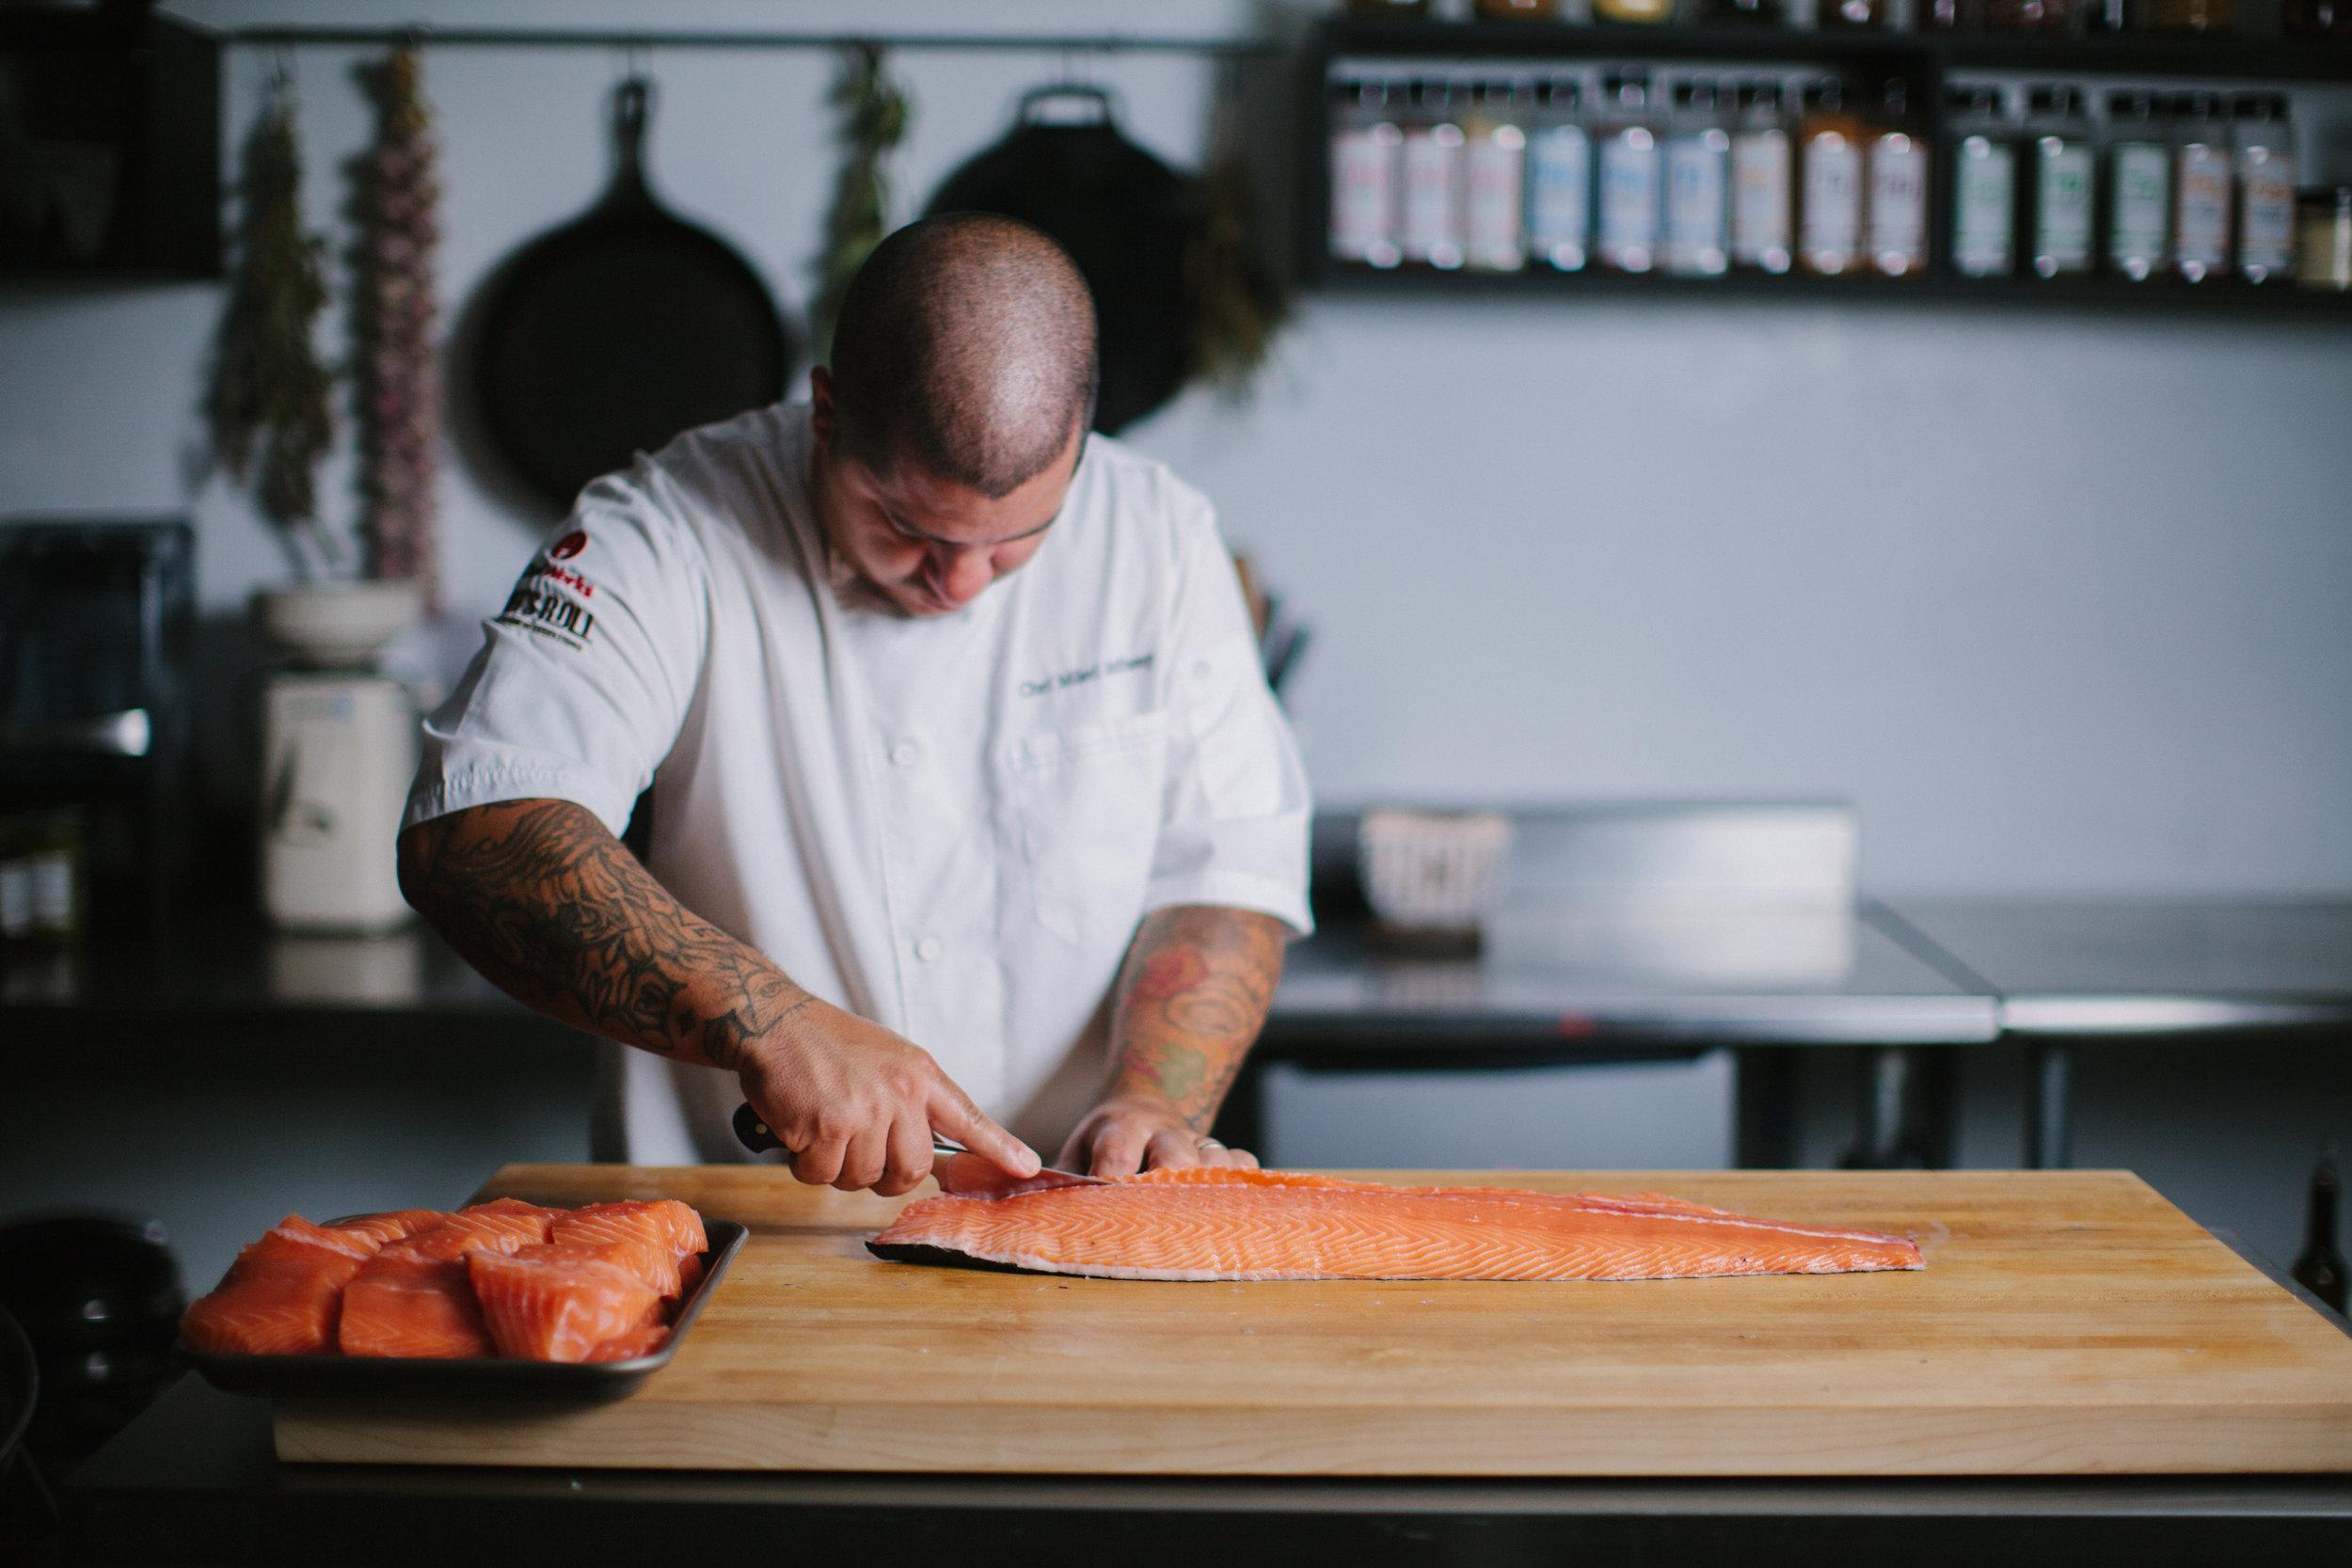 Chef working with Verlasso salmon